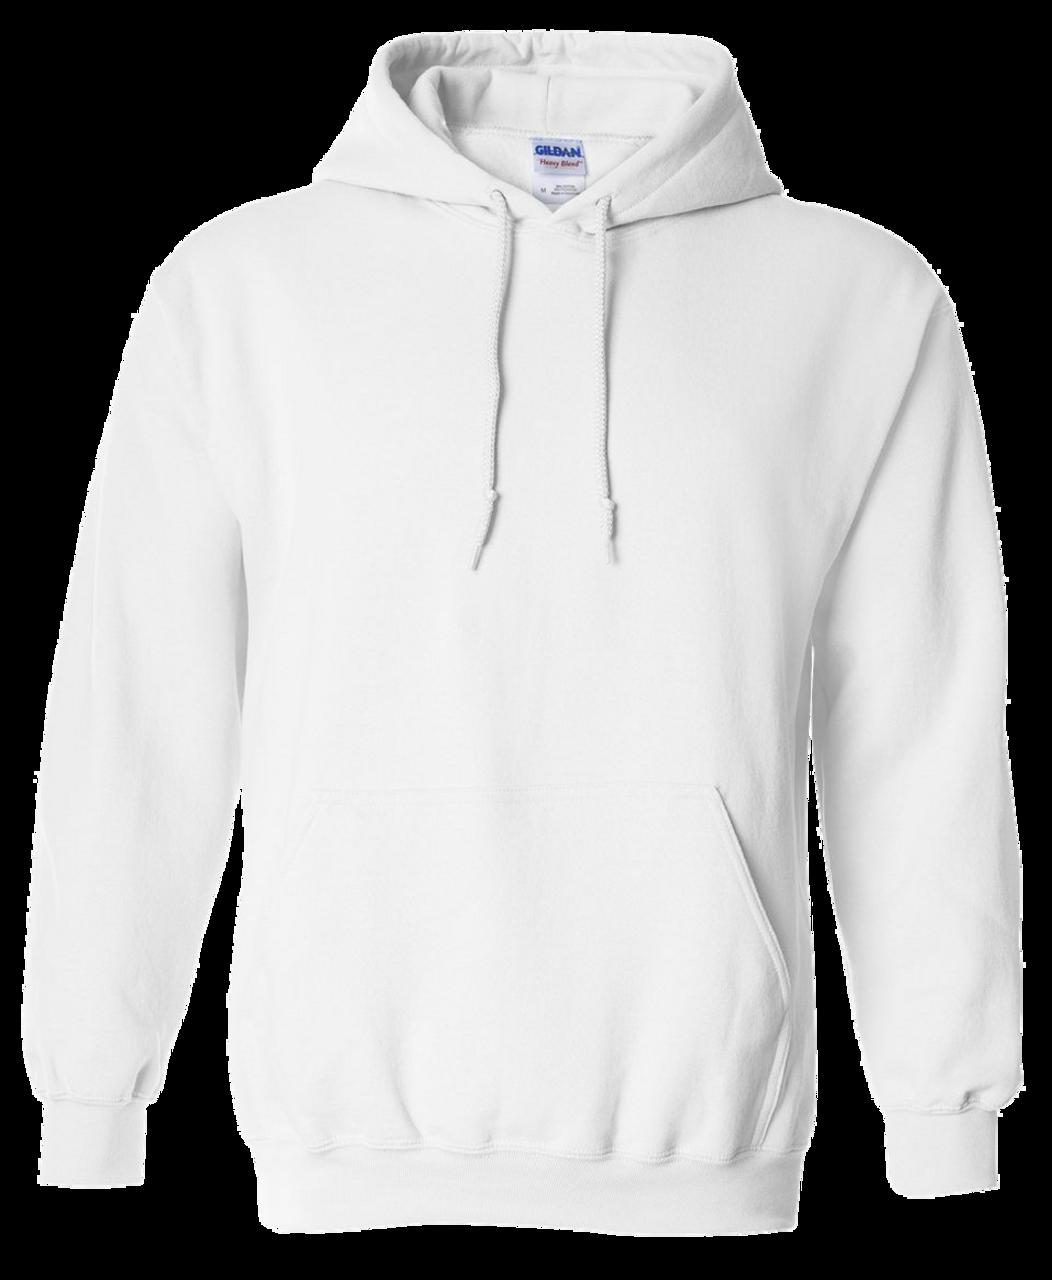 G18500 in White